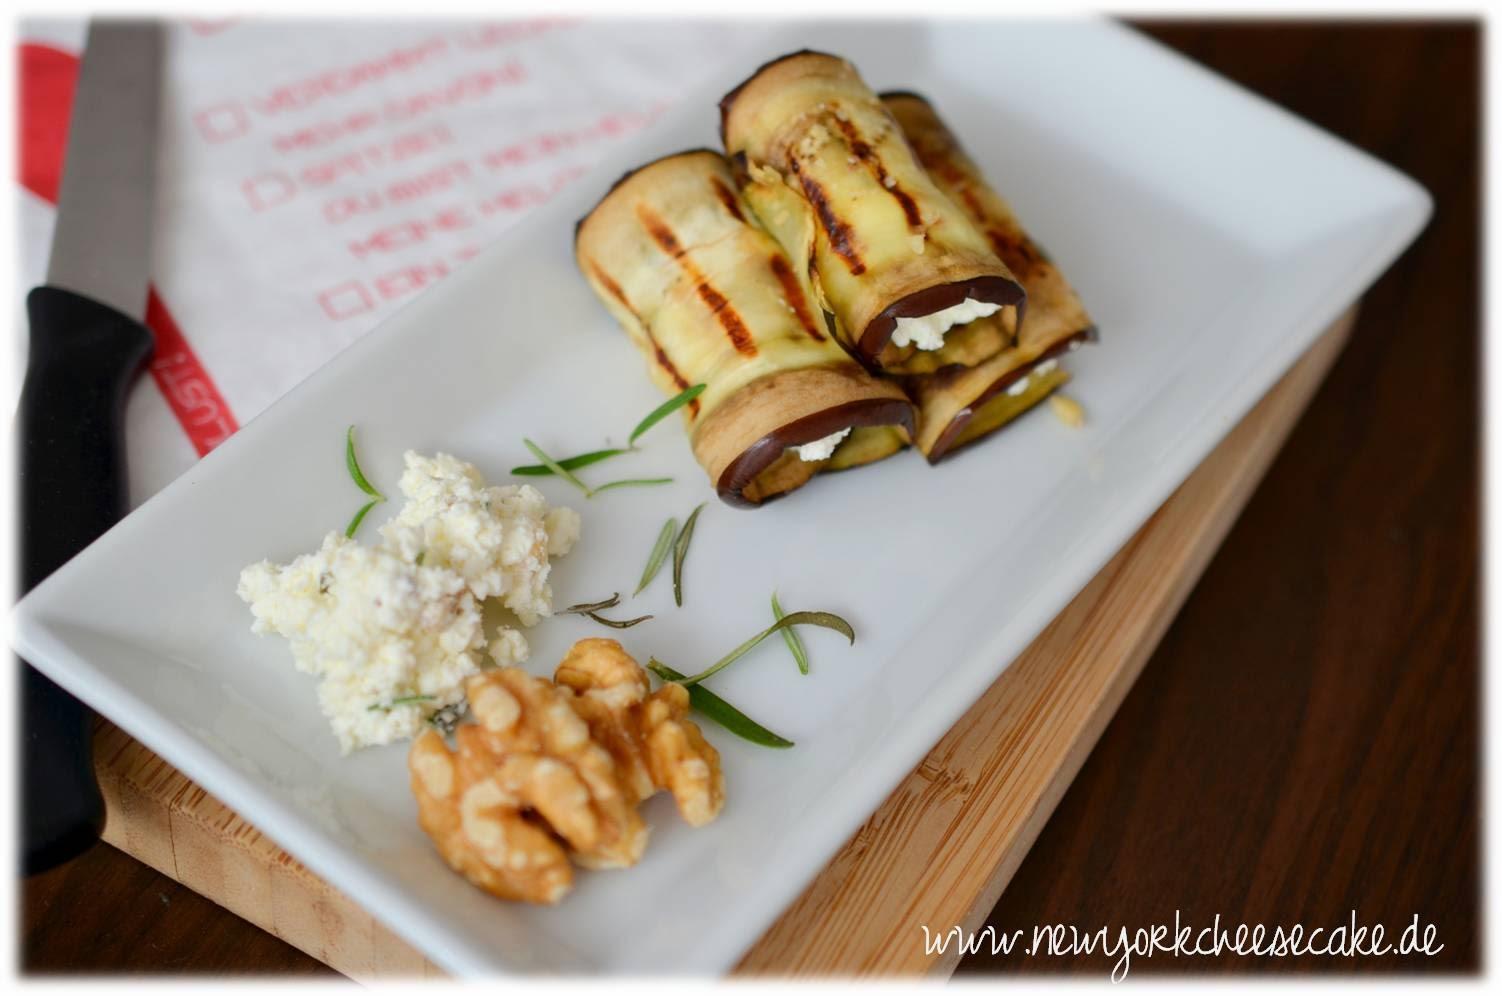 Aubergine, Fingerfood, Käse, Grillen